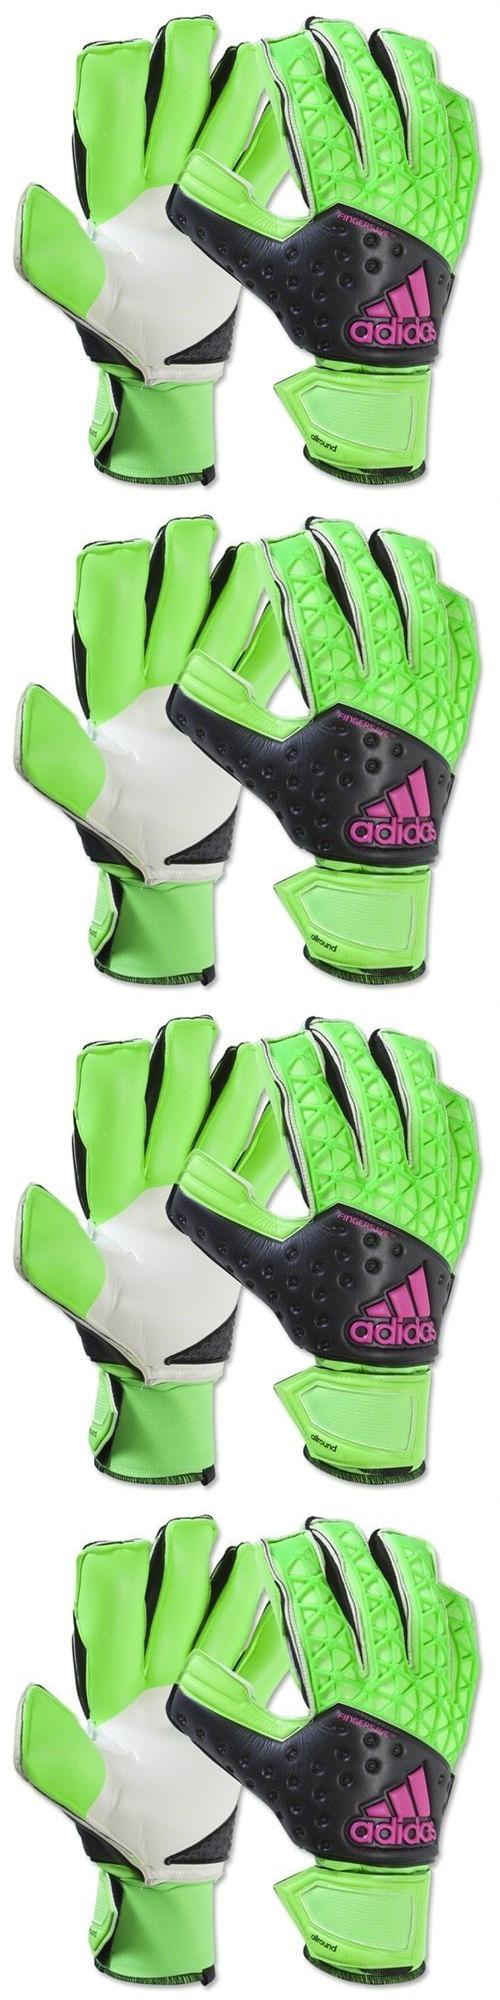 Gloves 57277: Adidas Goalkeeper Gloves Ace Zones Pro Sz 8 Solar Green Black Shock Pink Ah7803 -> BUY IT NOW ONLY: $85 on eBay!